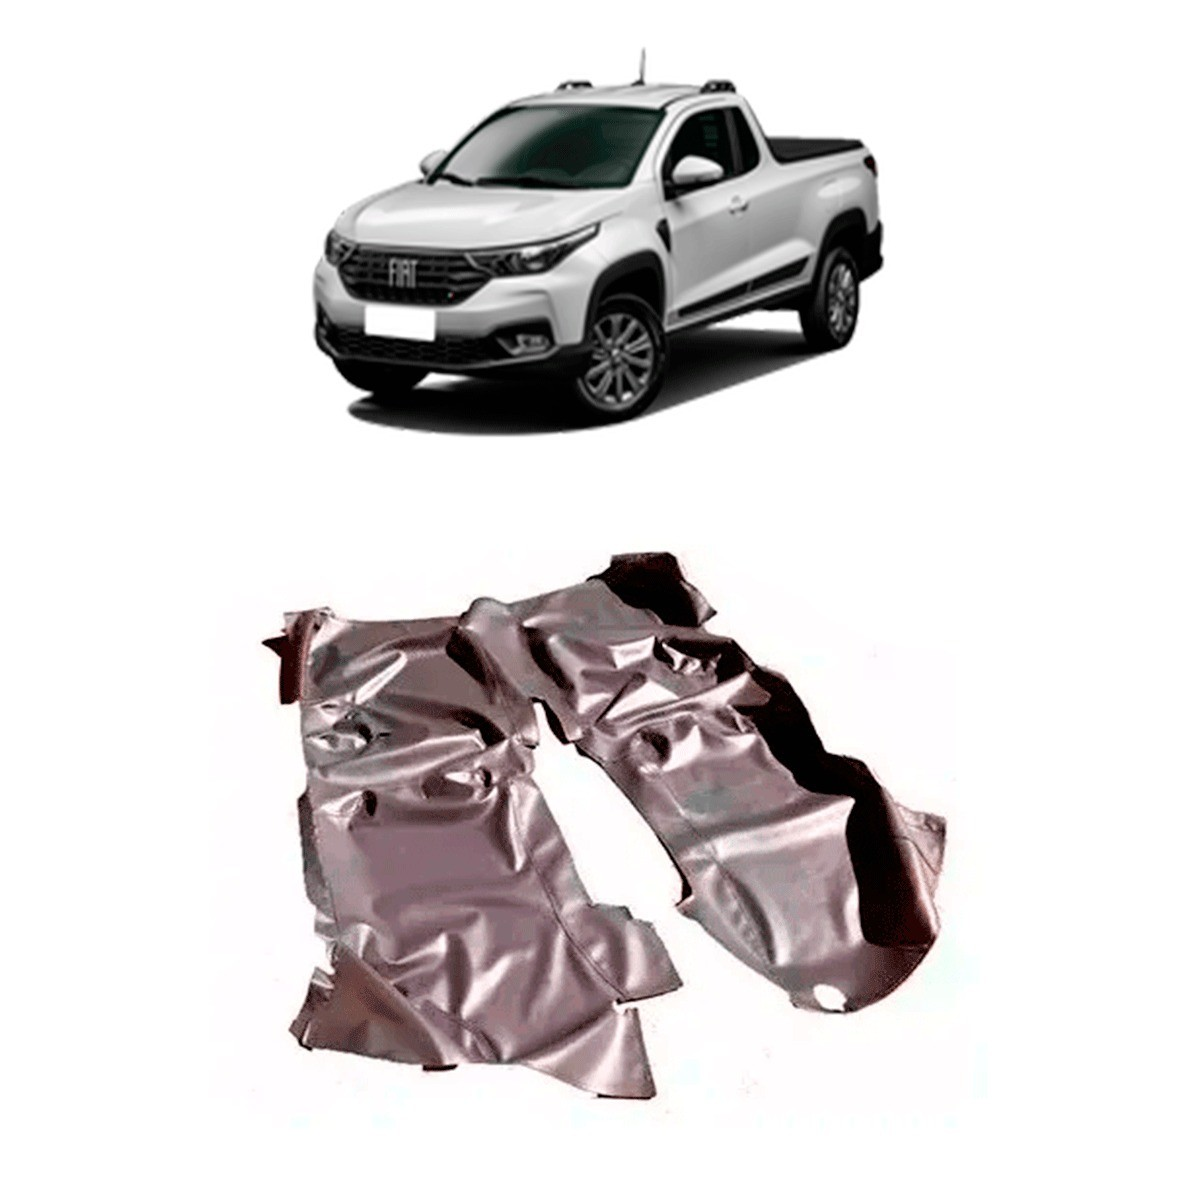 TAPETE VERNIZ AUTOMOTIVO FIAT STRADA 2020 NOVA SIMPLES PRETO